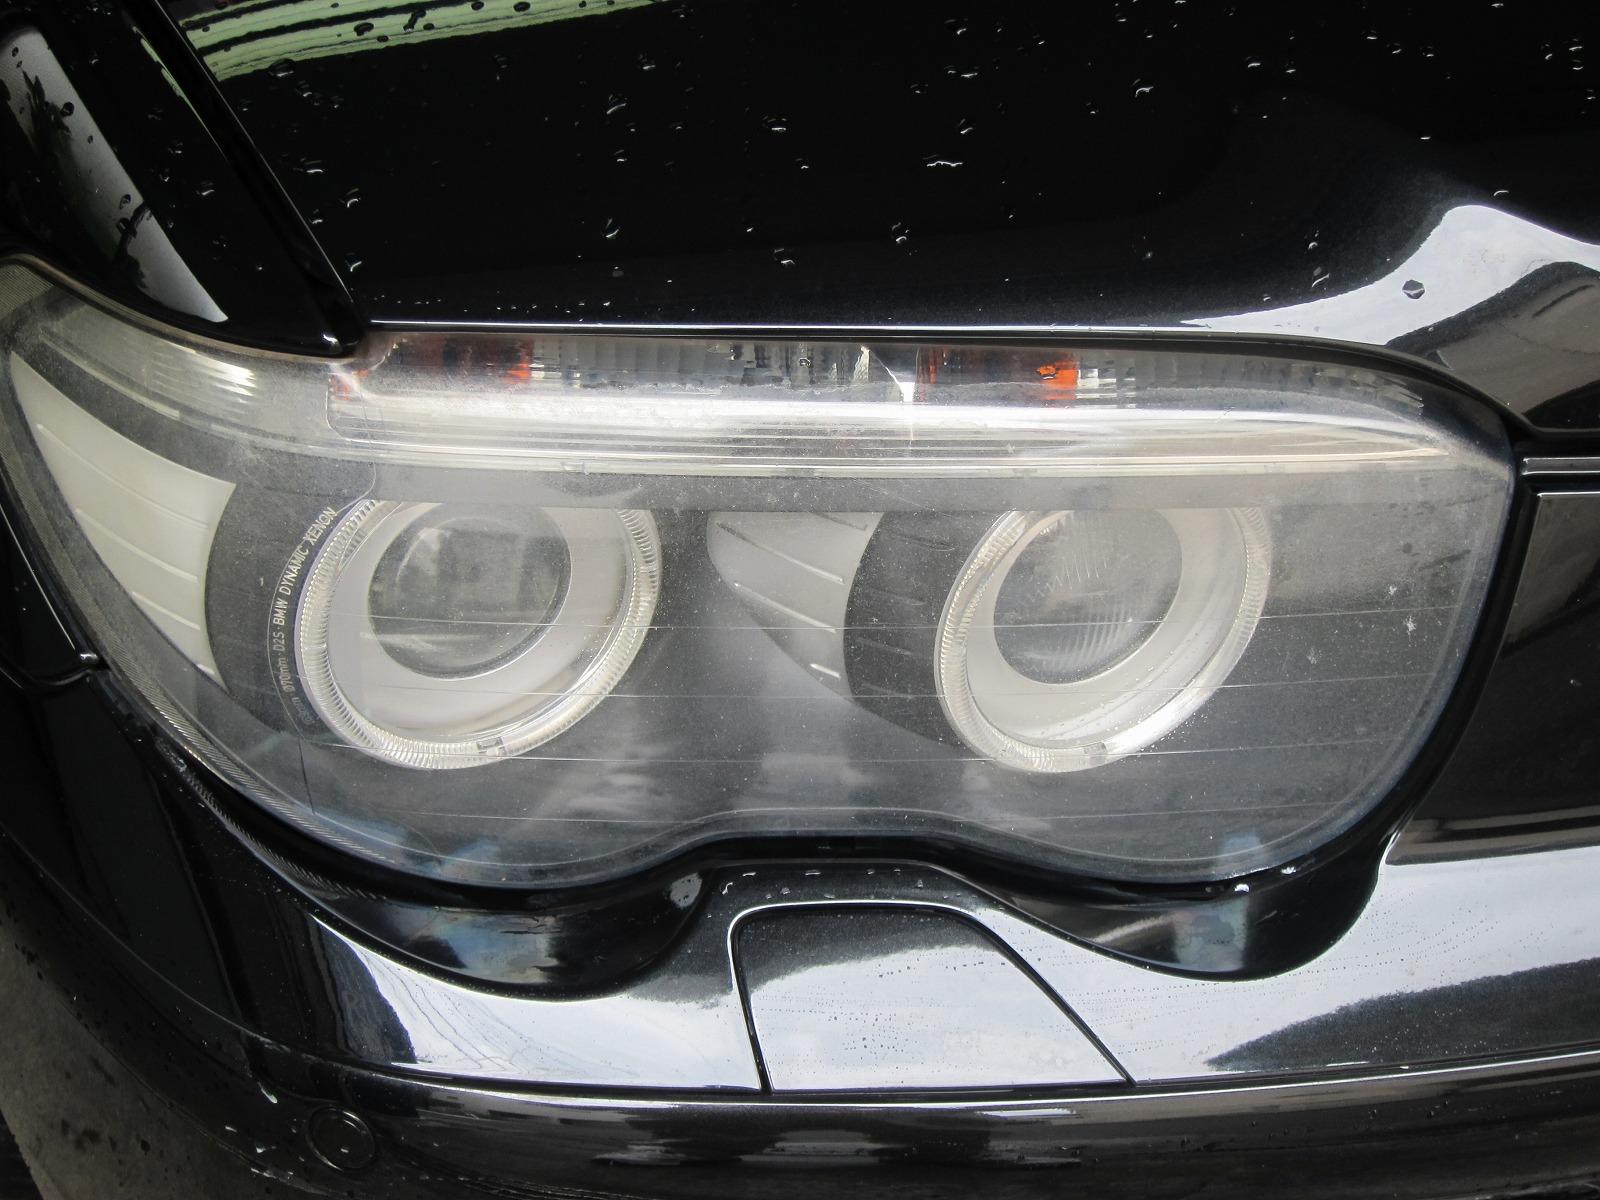 20160518bmw-745i-headlight-cleaning-04